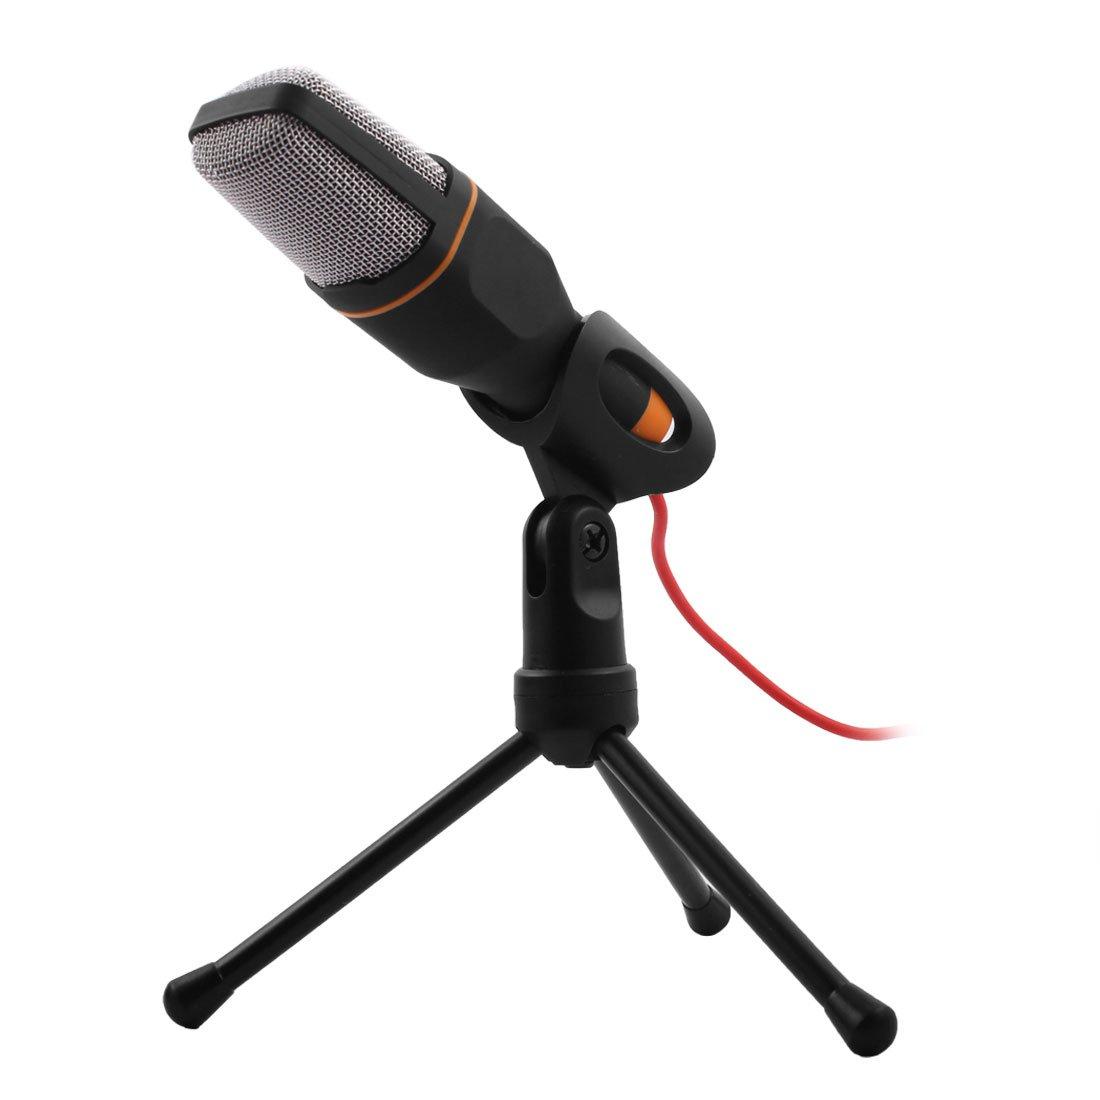 uxcell PC Laptop Computer Adjustable Stand 3.5mm Jack Condenser Sound Podcast Studio Microphone Black